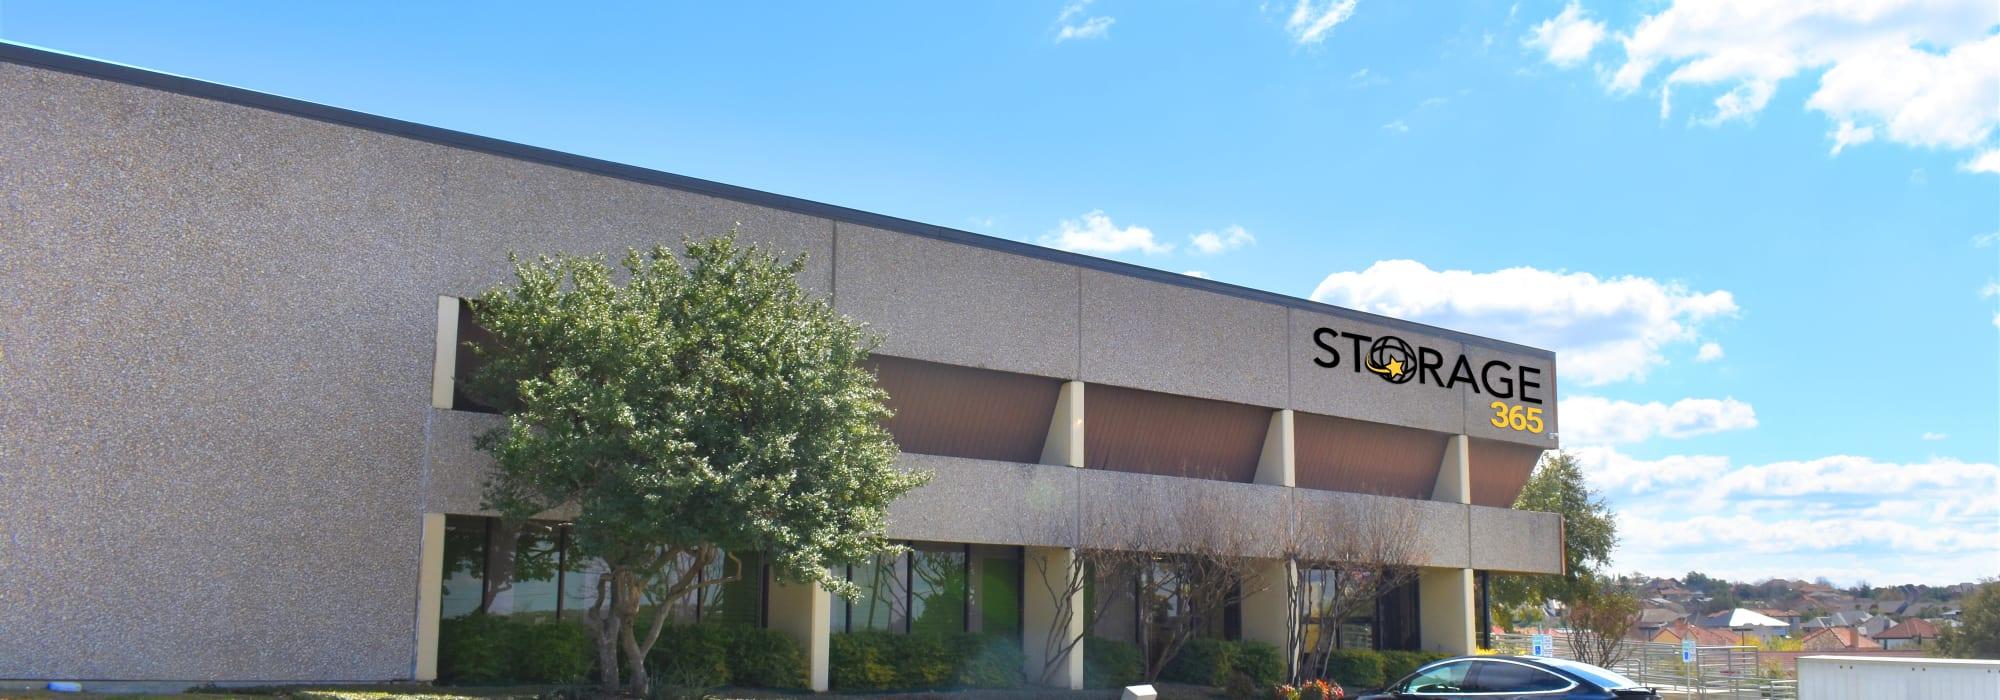 Storage 365 self storage in Irving, Texas